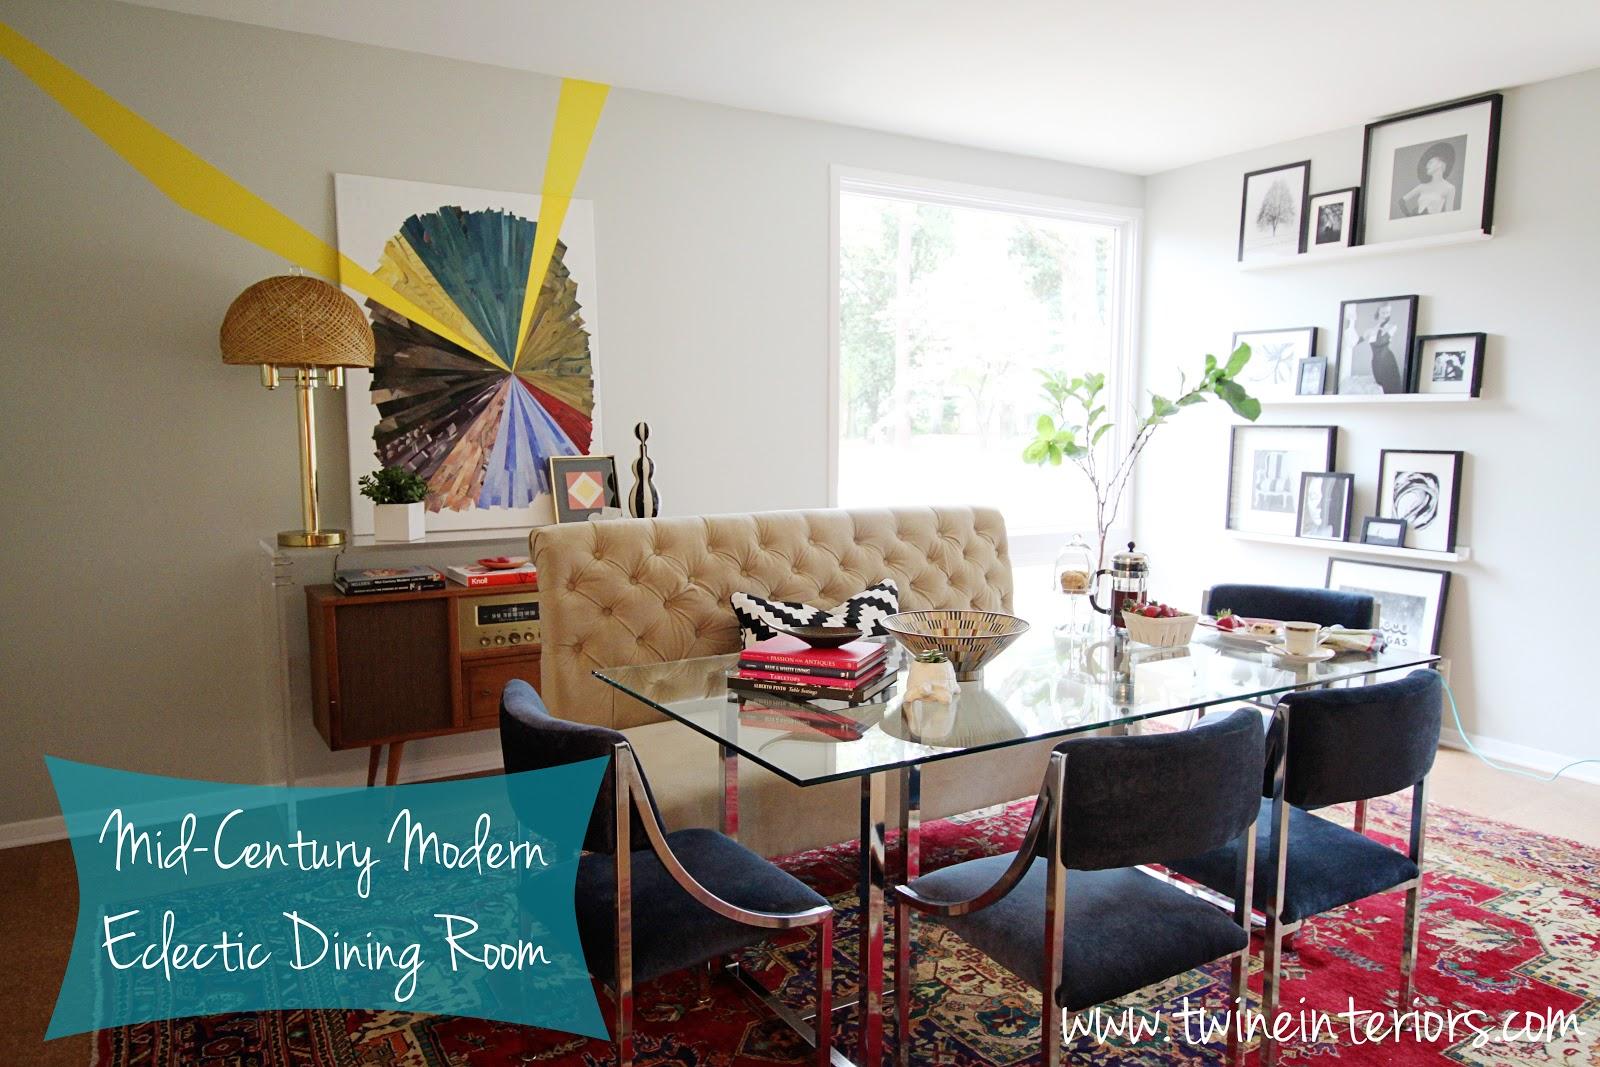 Twine: Historic Tyler Spring Home Tour - The Designer Showcase